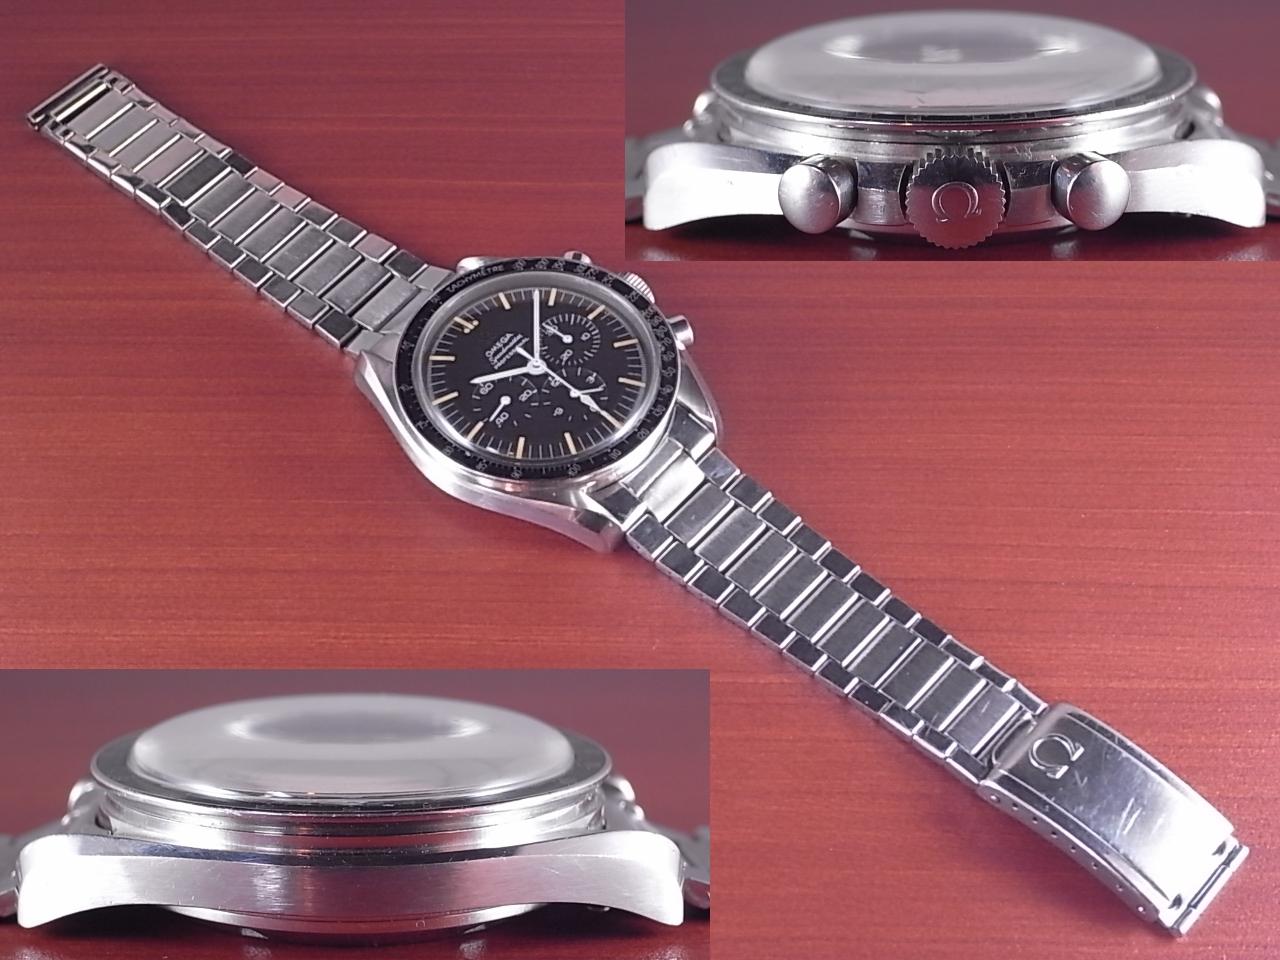 finest selection 0e0b5 8b5c9 オメガ スピードマスター 4th フォースモデル Ref.105.012 ...